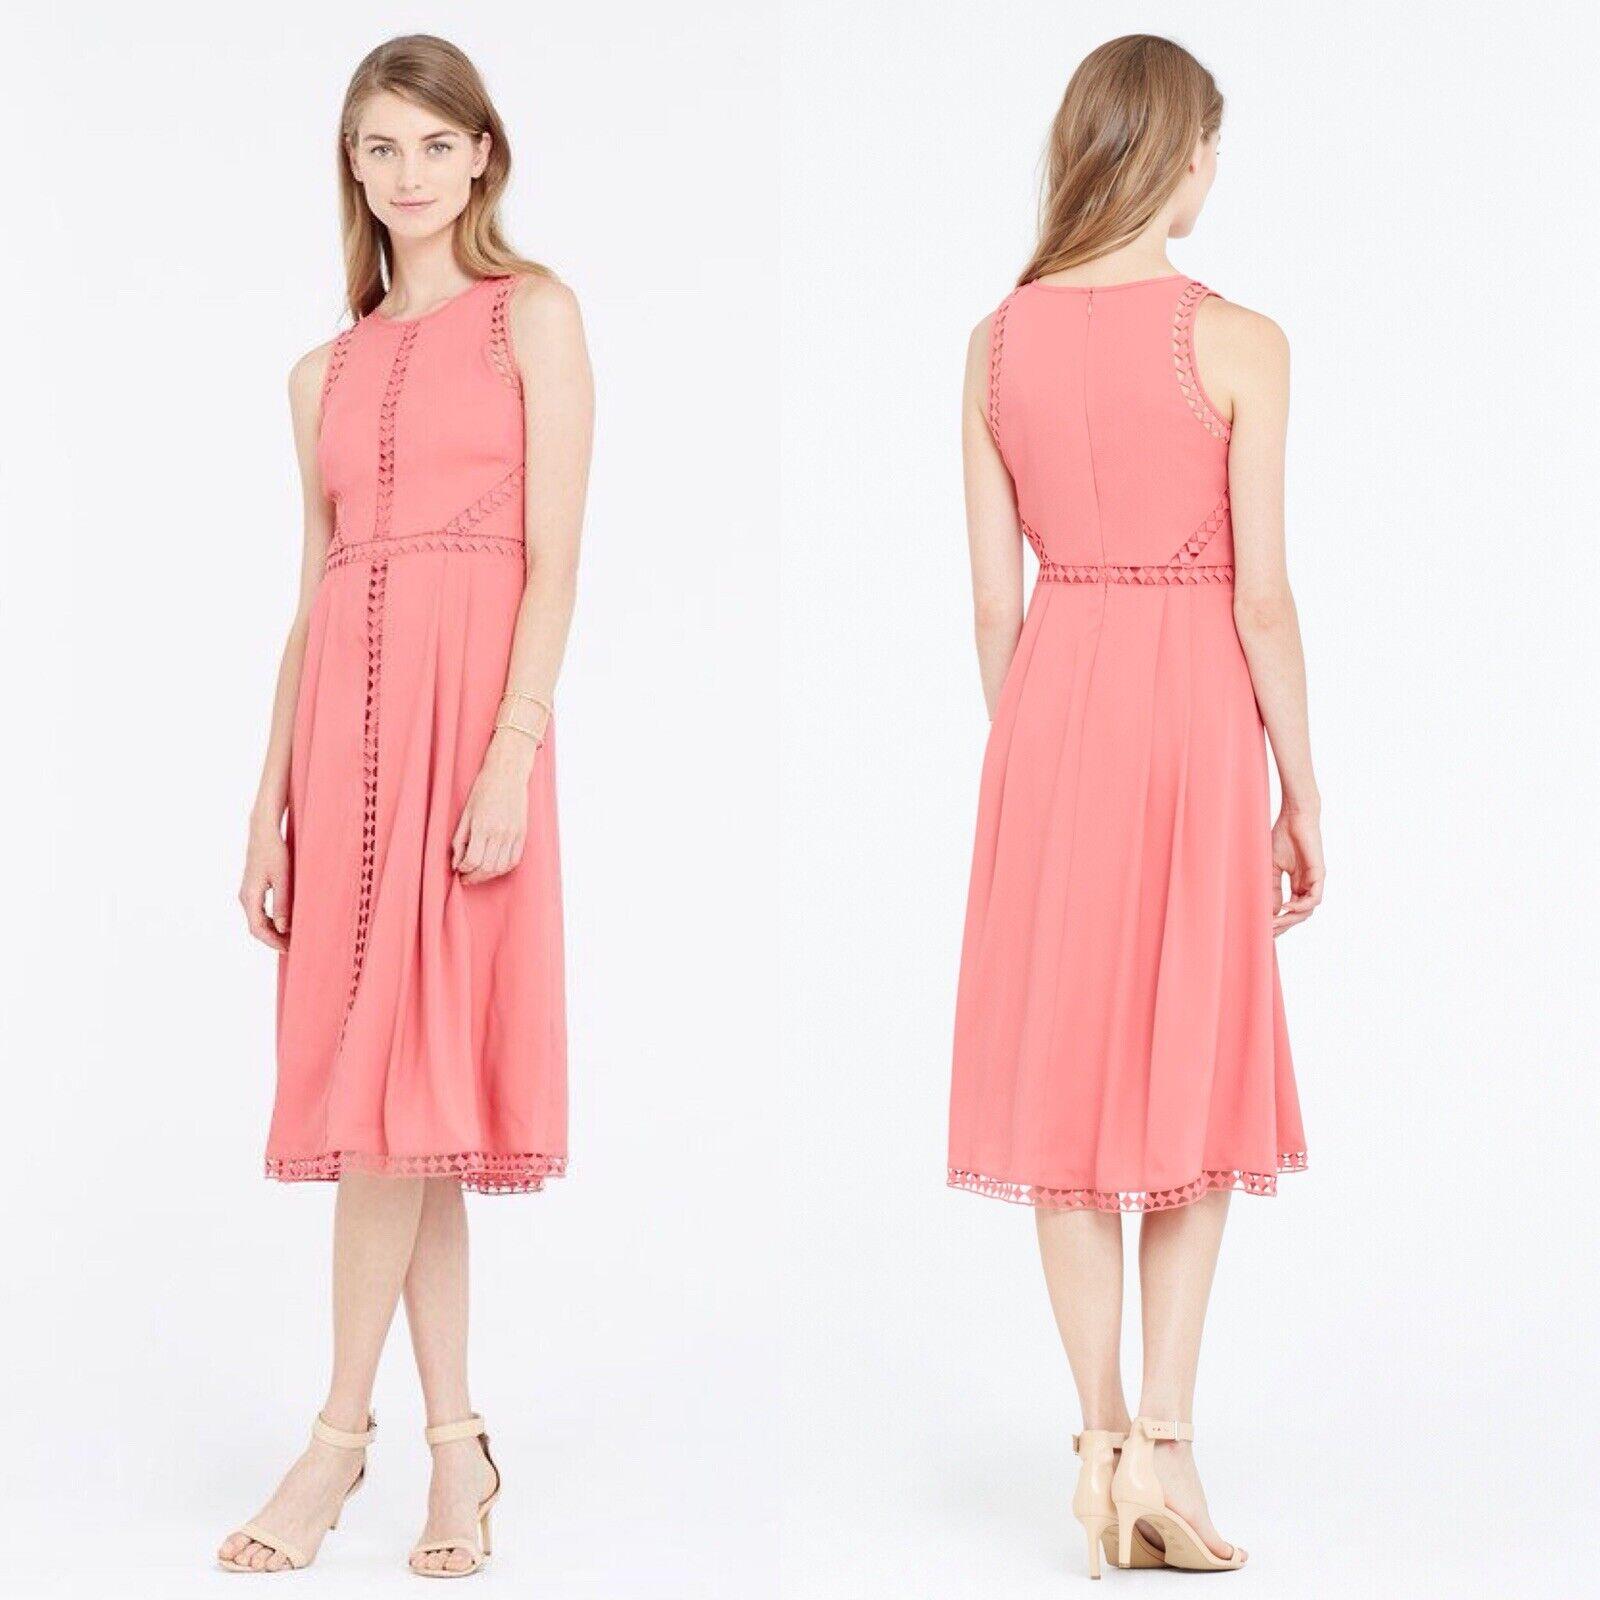 NWT Ann Taylor Dark Begonia Rosa Embroiderot Trim Midi Dress Größe 10